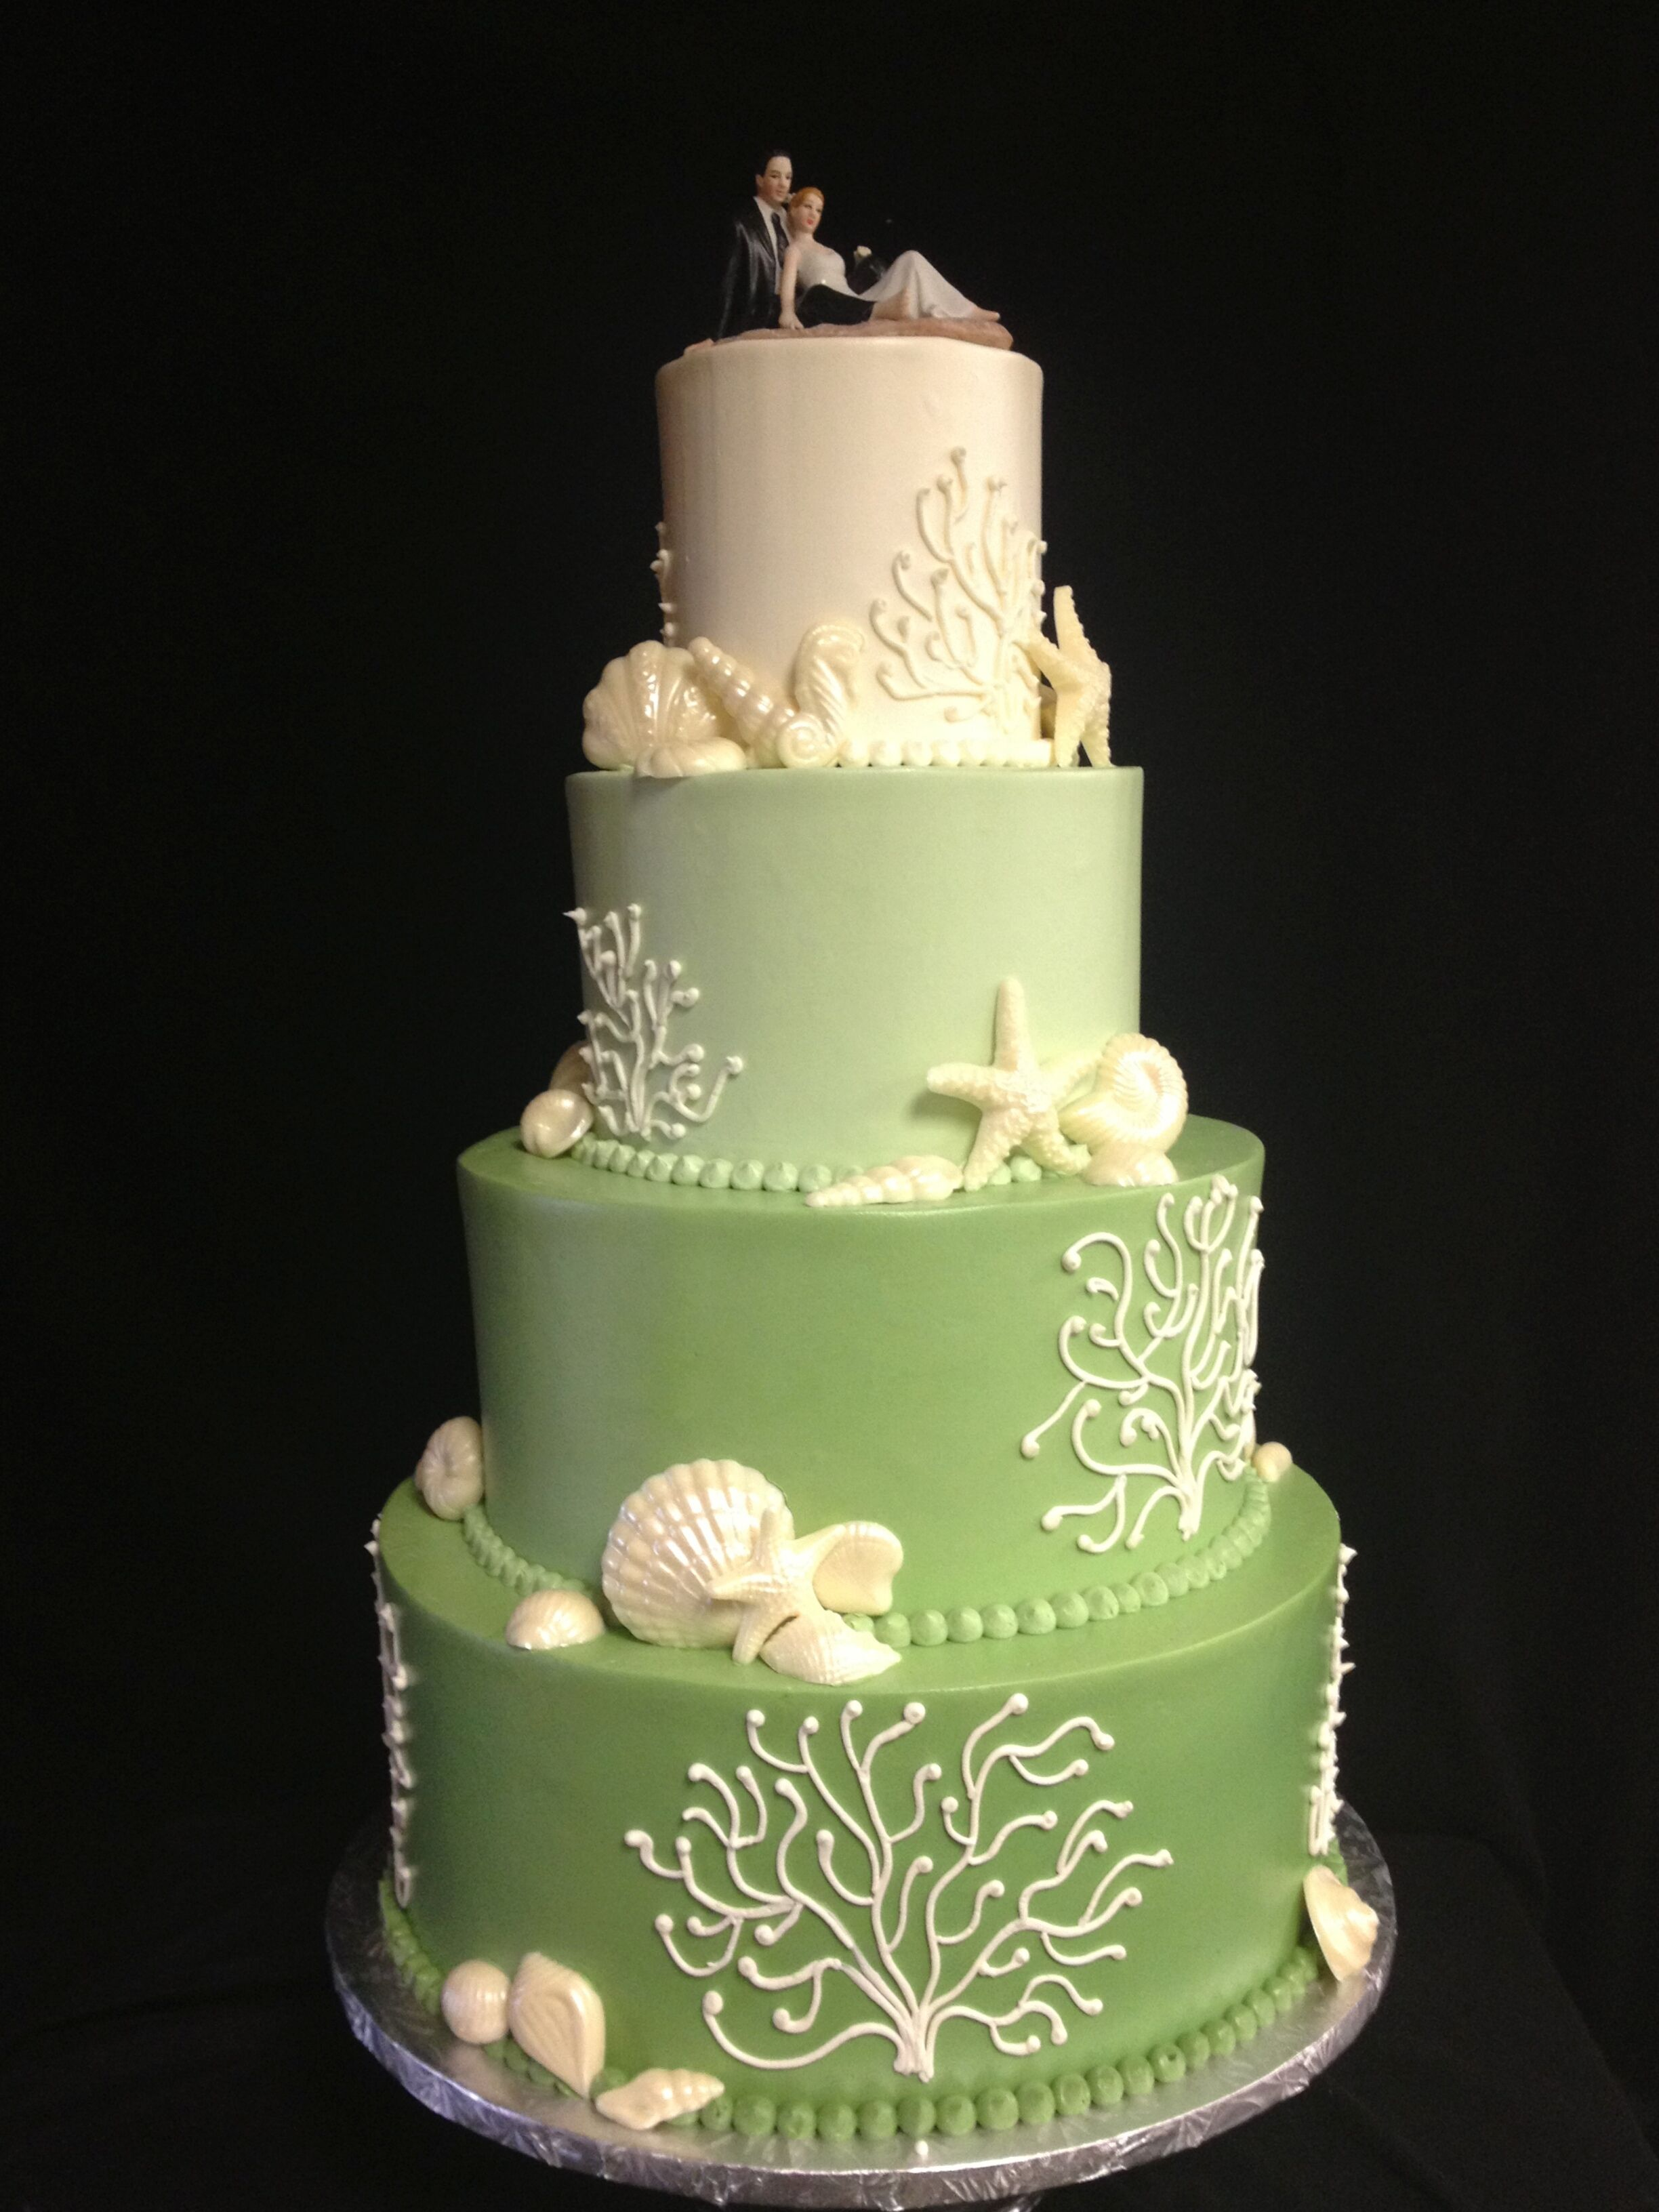 Wedding Cake Bakeries in Ocean City, NJ - The Knot